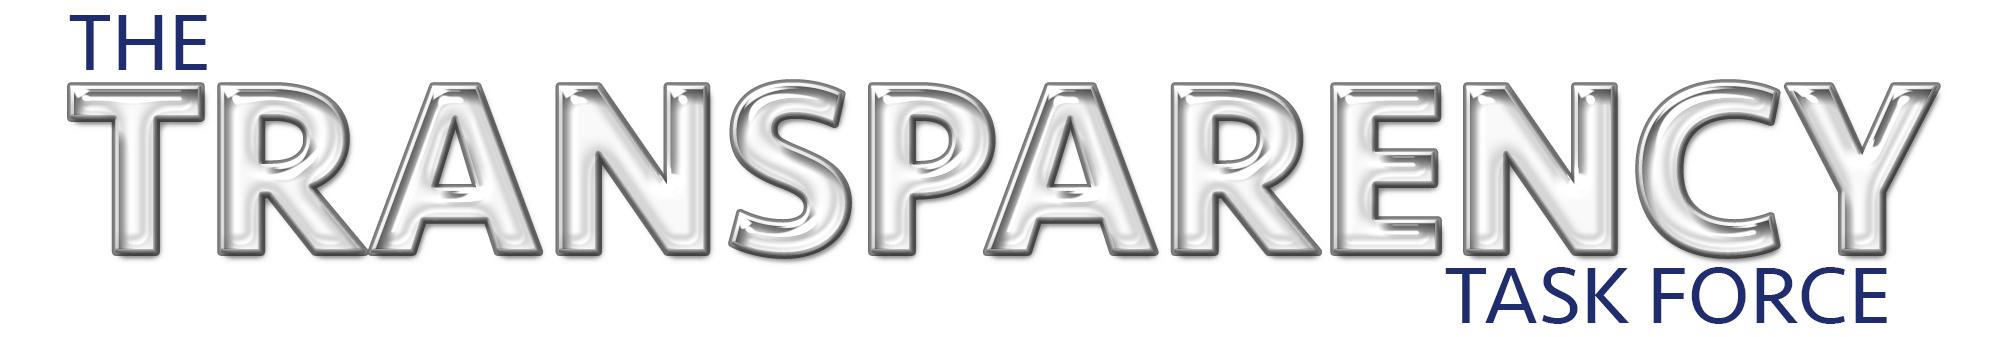 Transparency Task Force logo